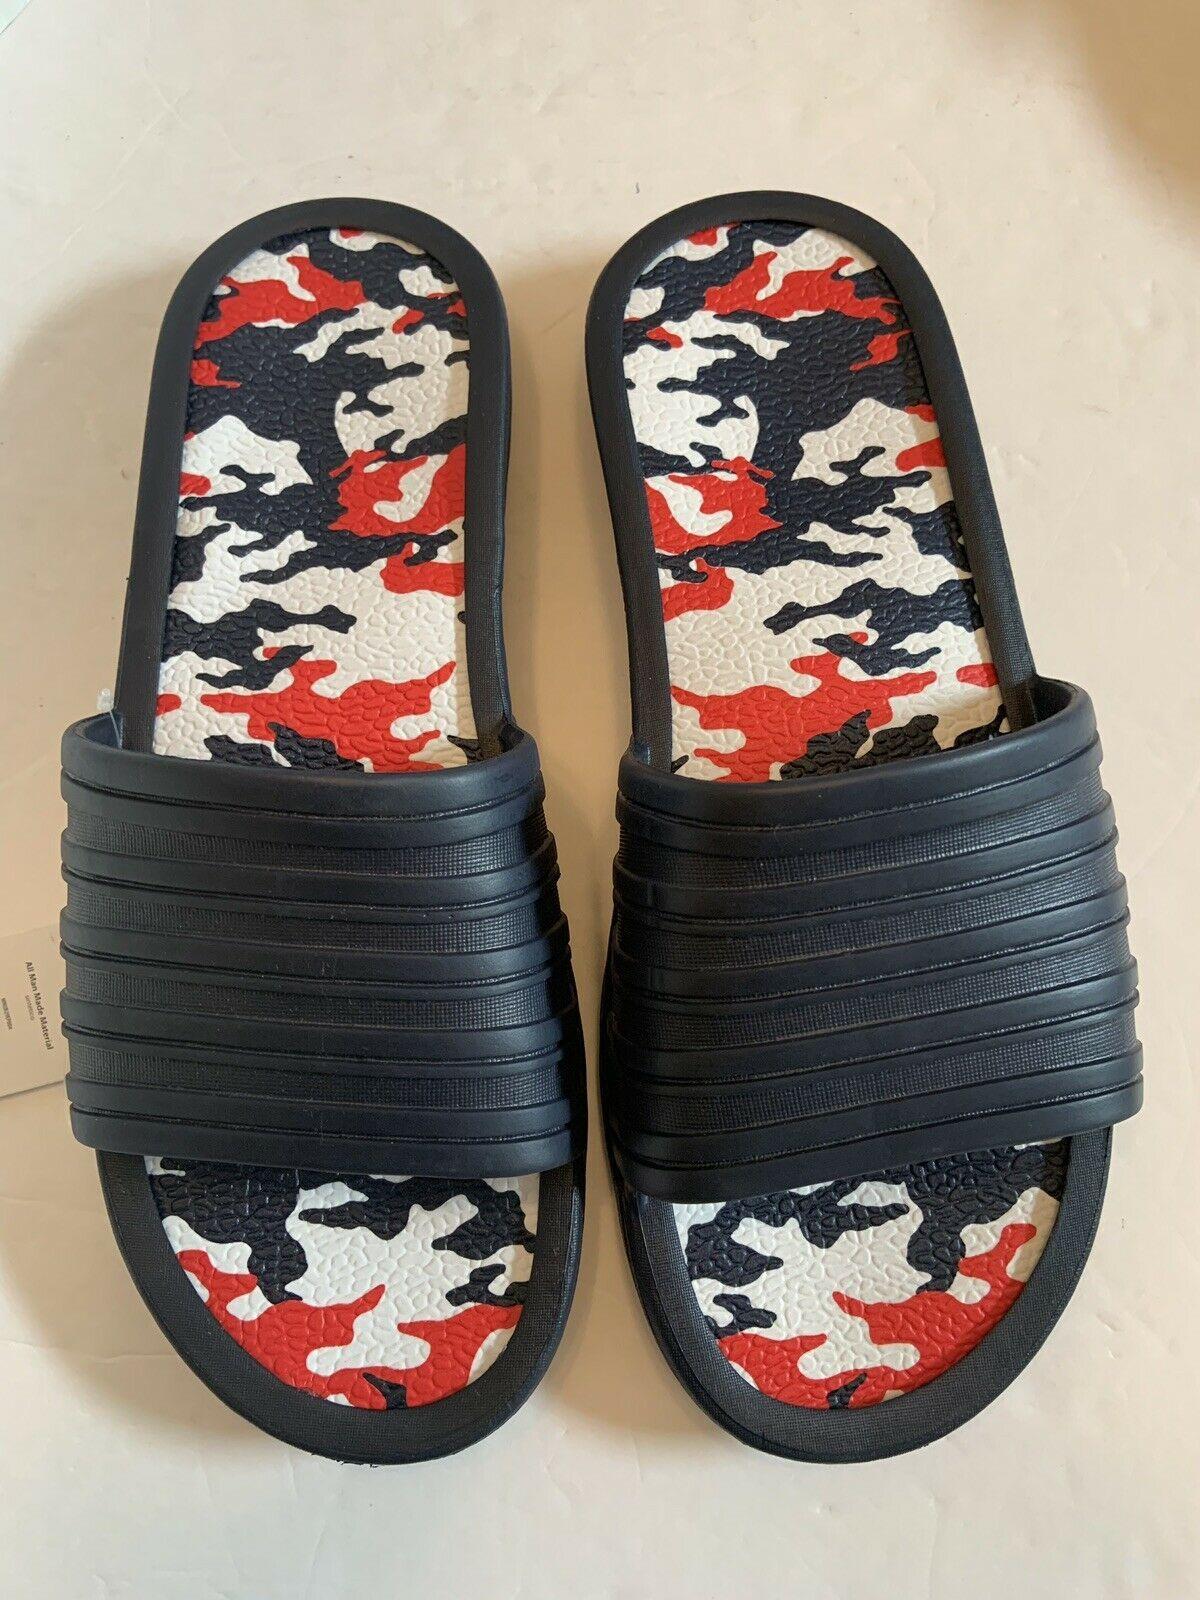 Men tunnel slides sandals blue camo camouflage insole pick size 11-13